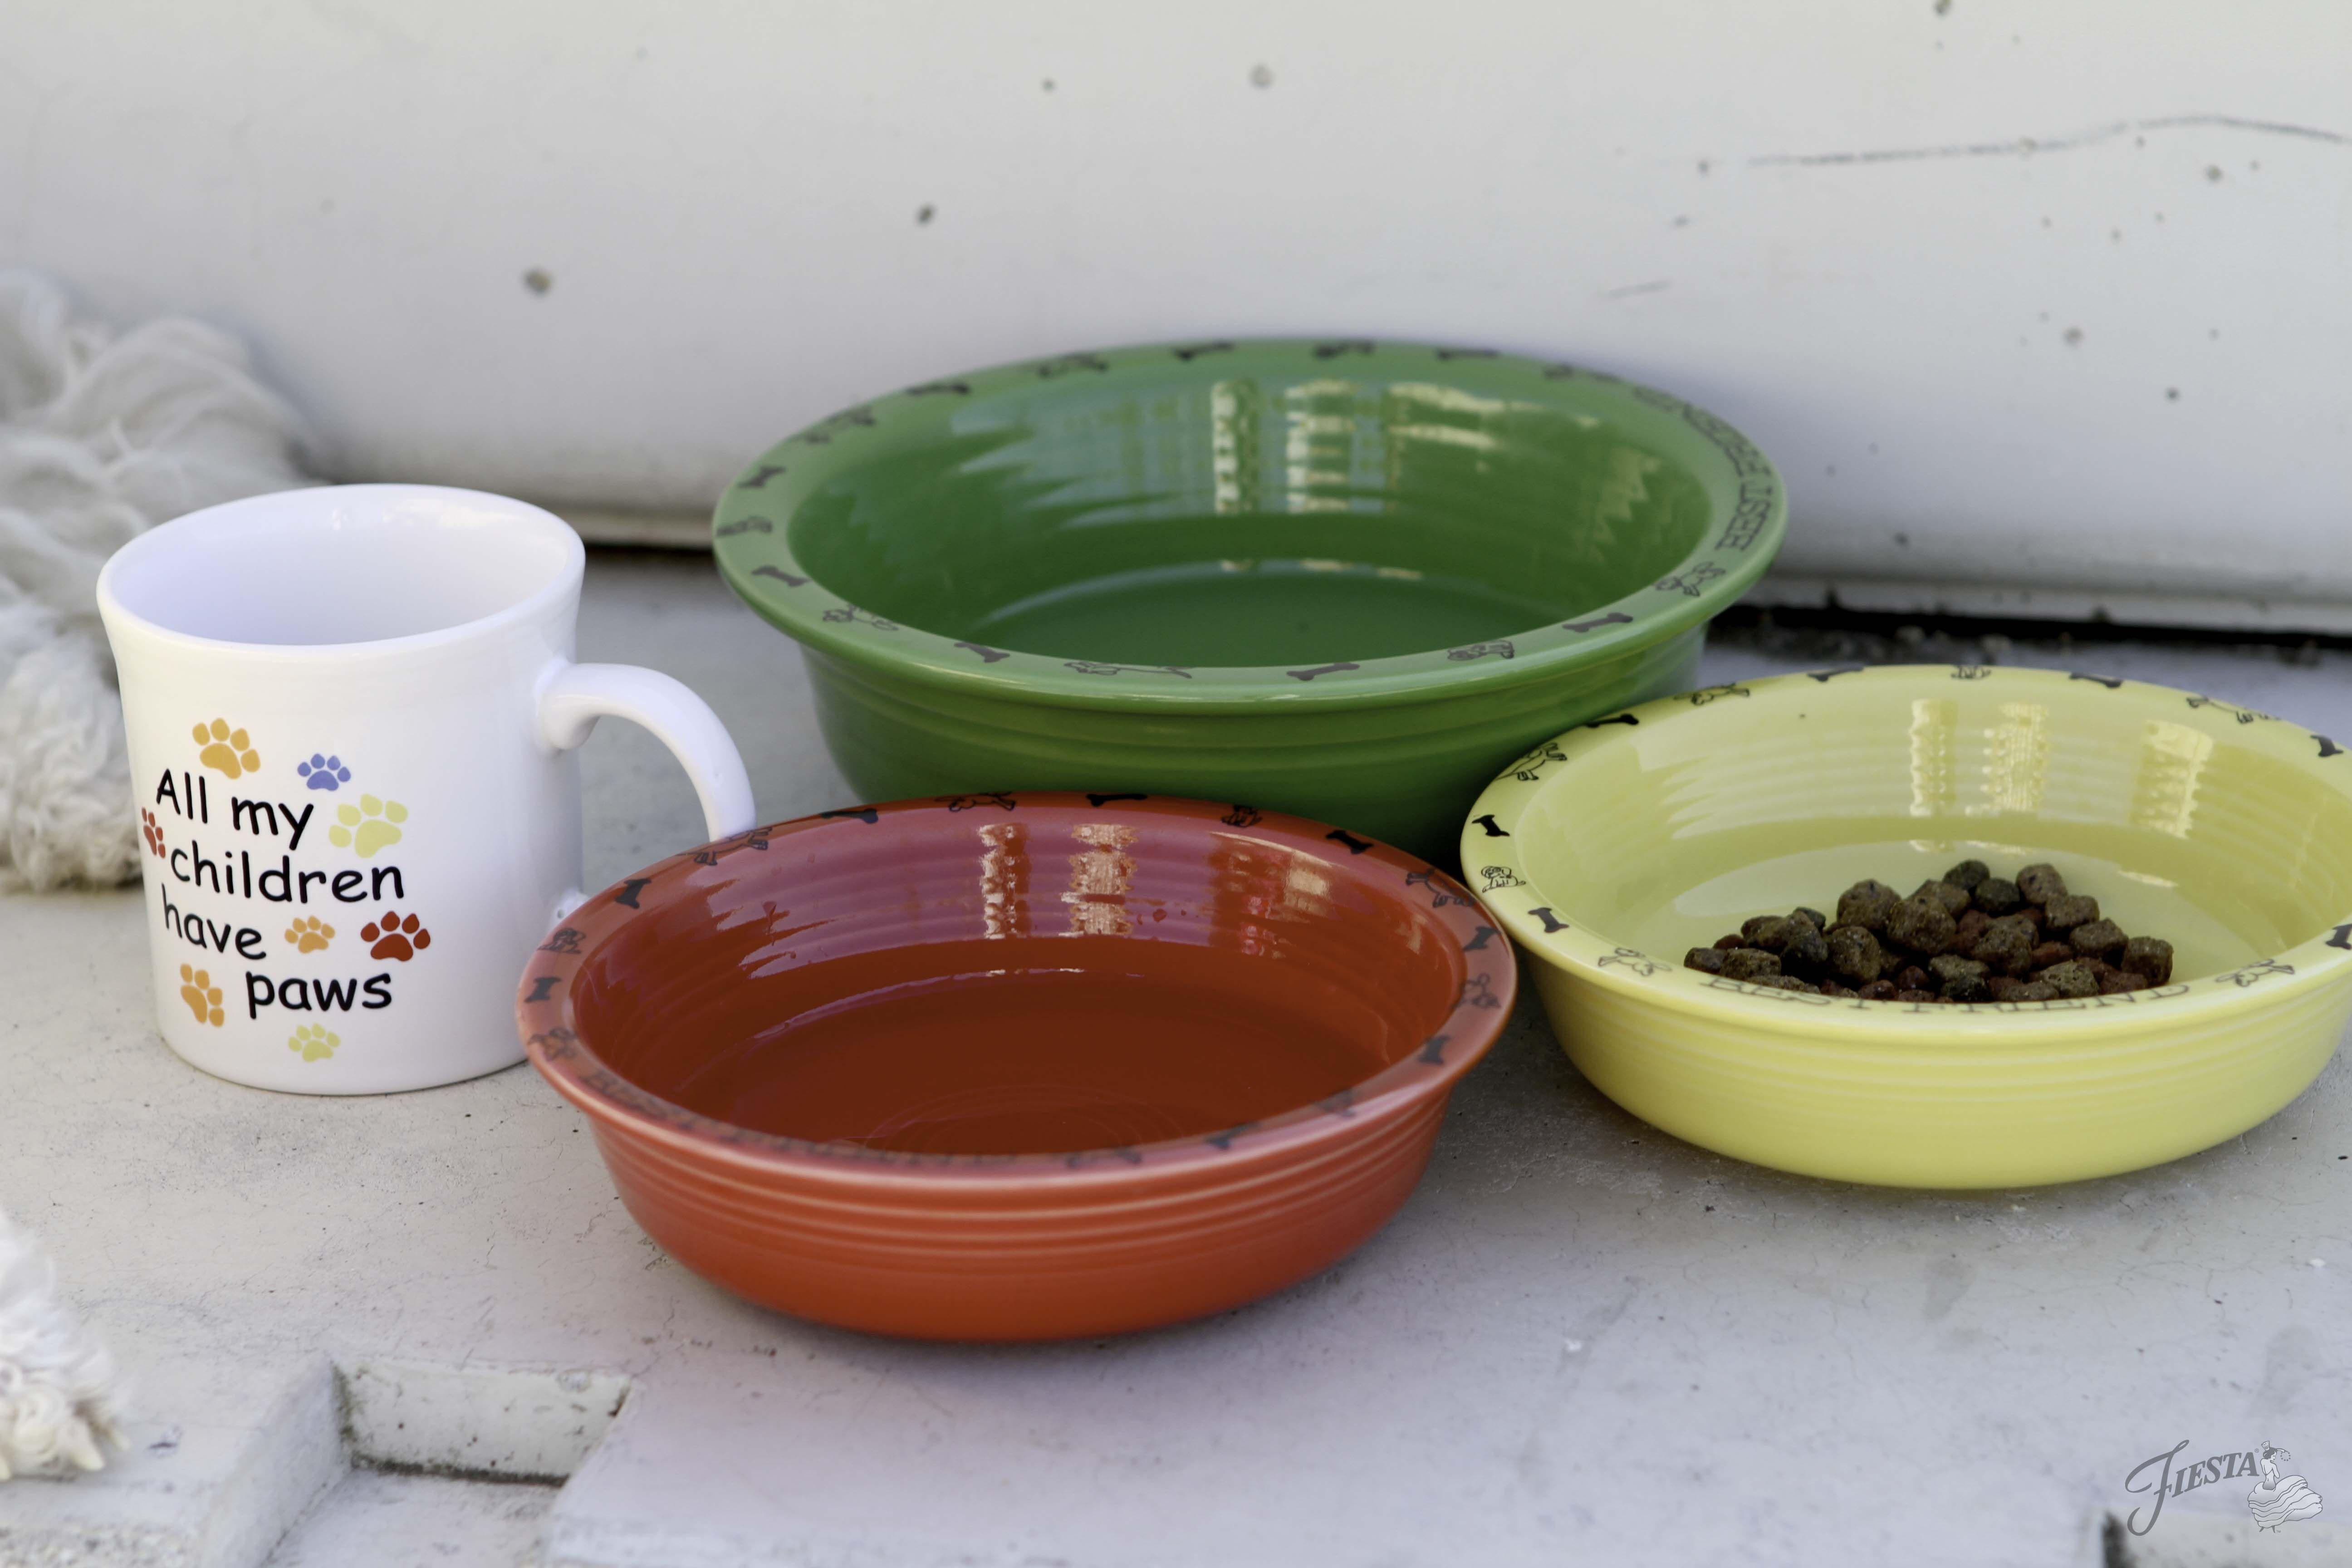 Fiesta Dinnerware Pet Bowls and Pet Lover Java Mugs at .fiestafactorydirect.com. & Fiesta Dinnerware Pet Bowls and Pet Lover Java Mugs at www ...